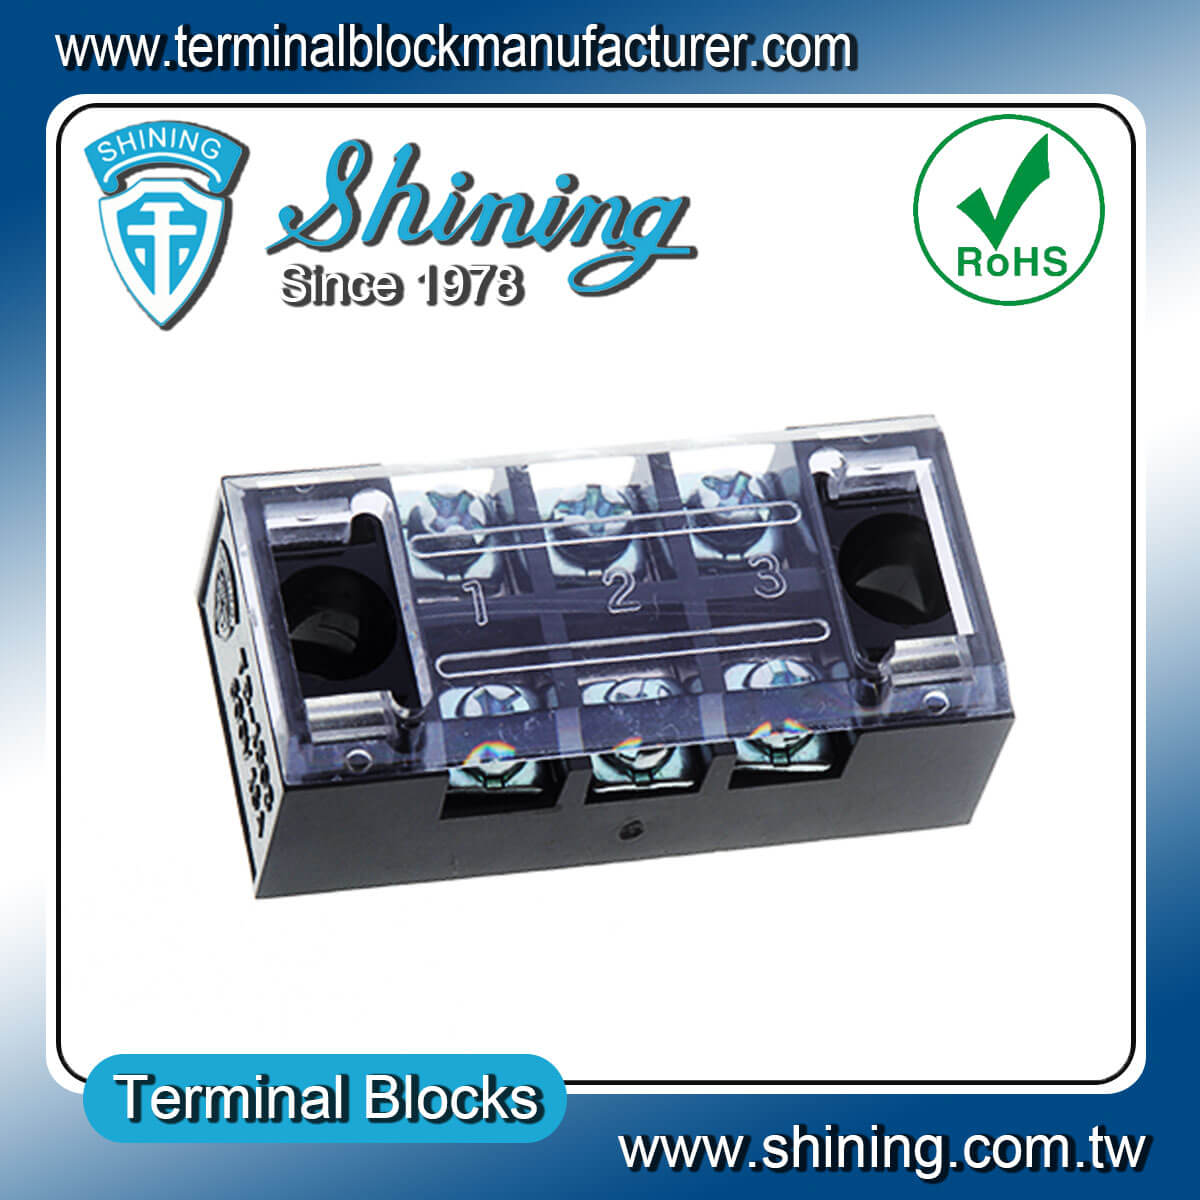 TB-3503 600V 35A 3Pole固定式柵欄端子台